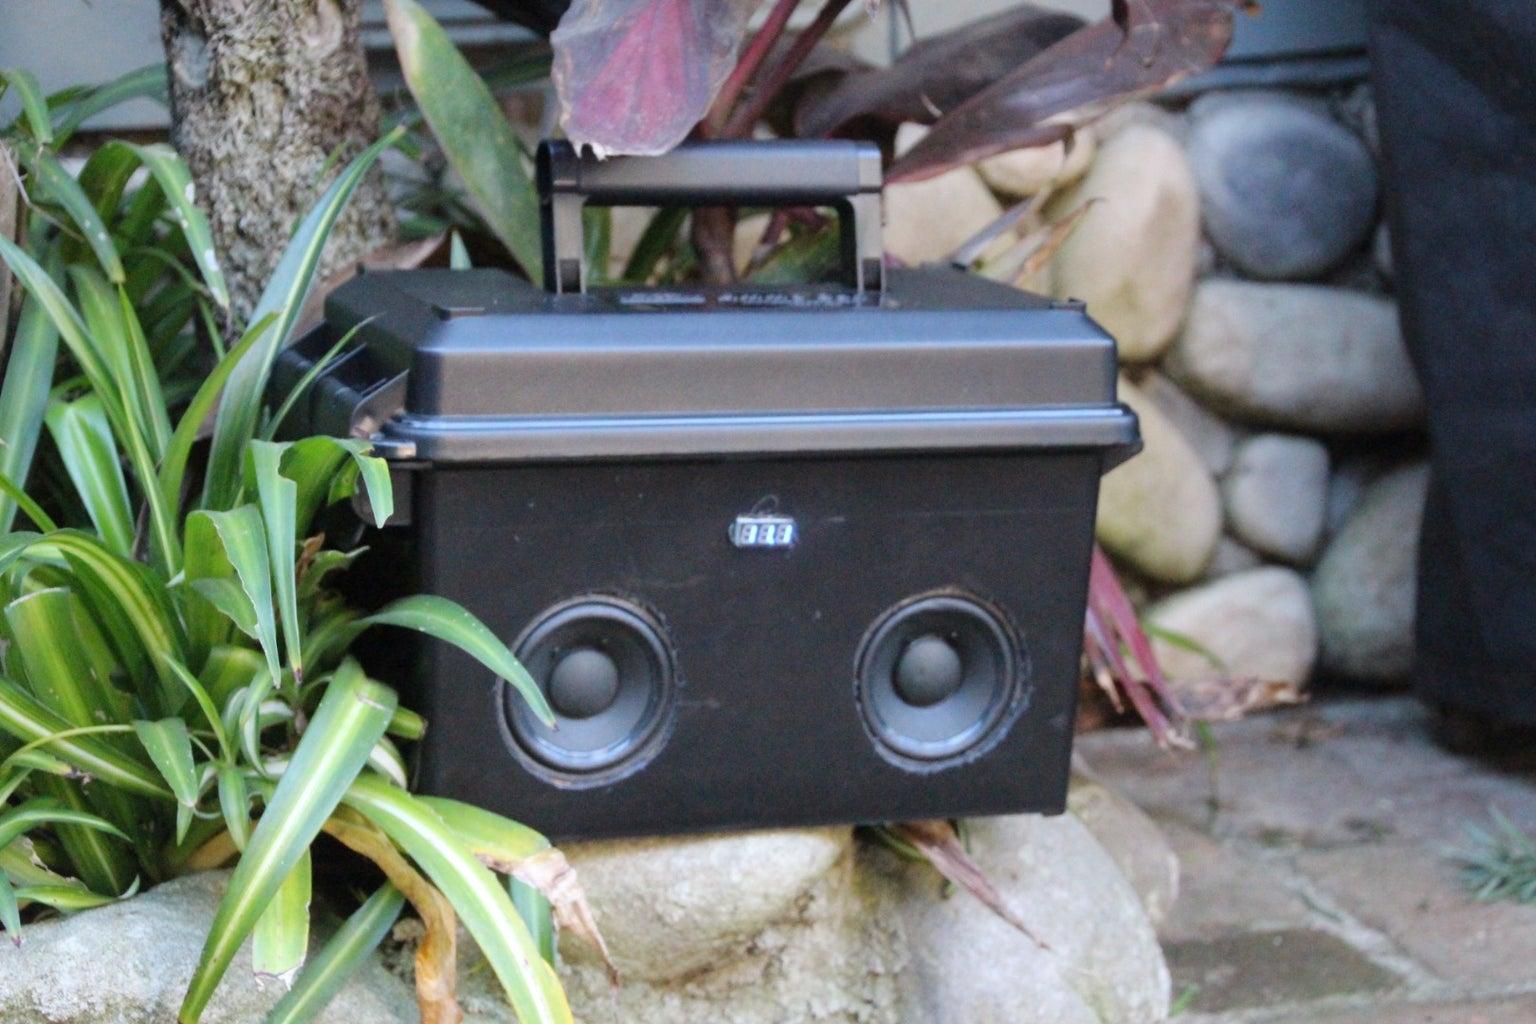 DIY Bluetooth Speaker 2.0